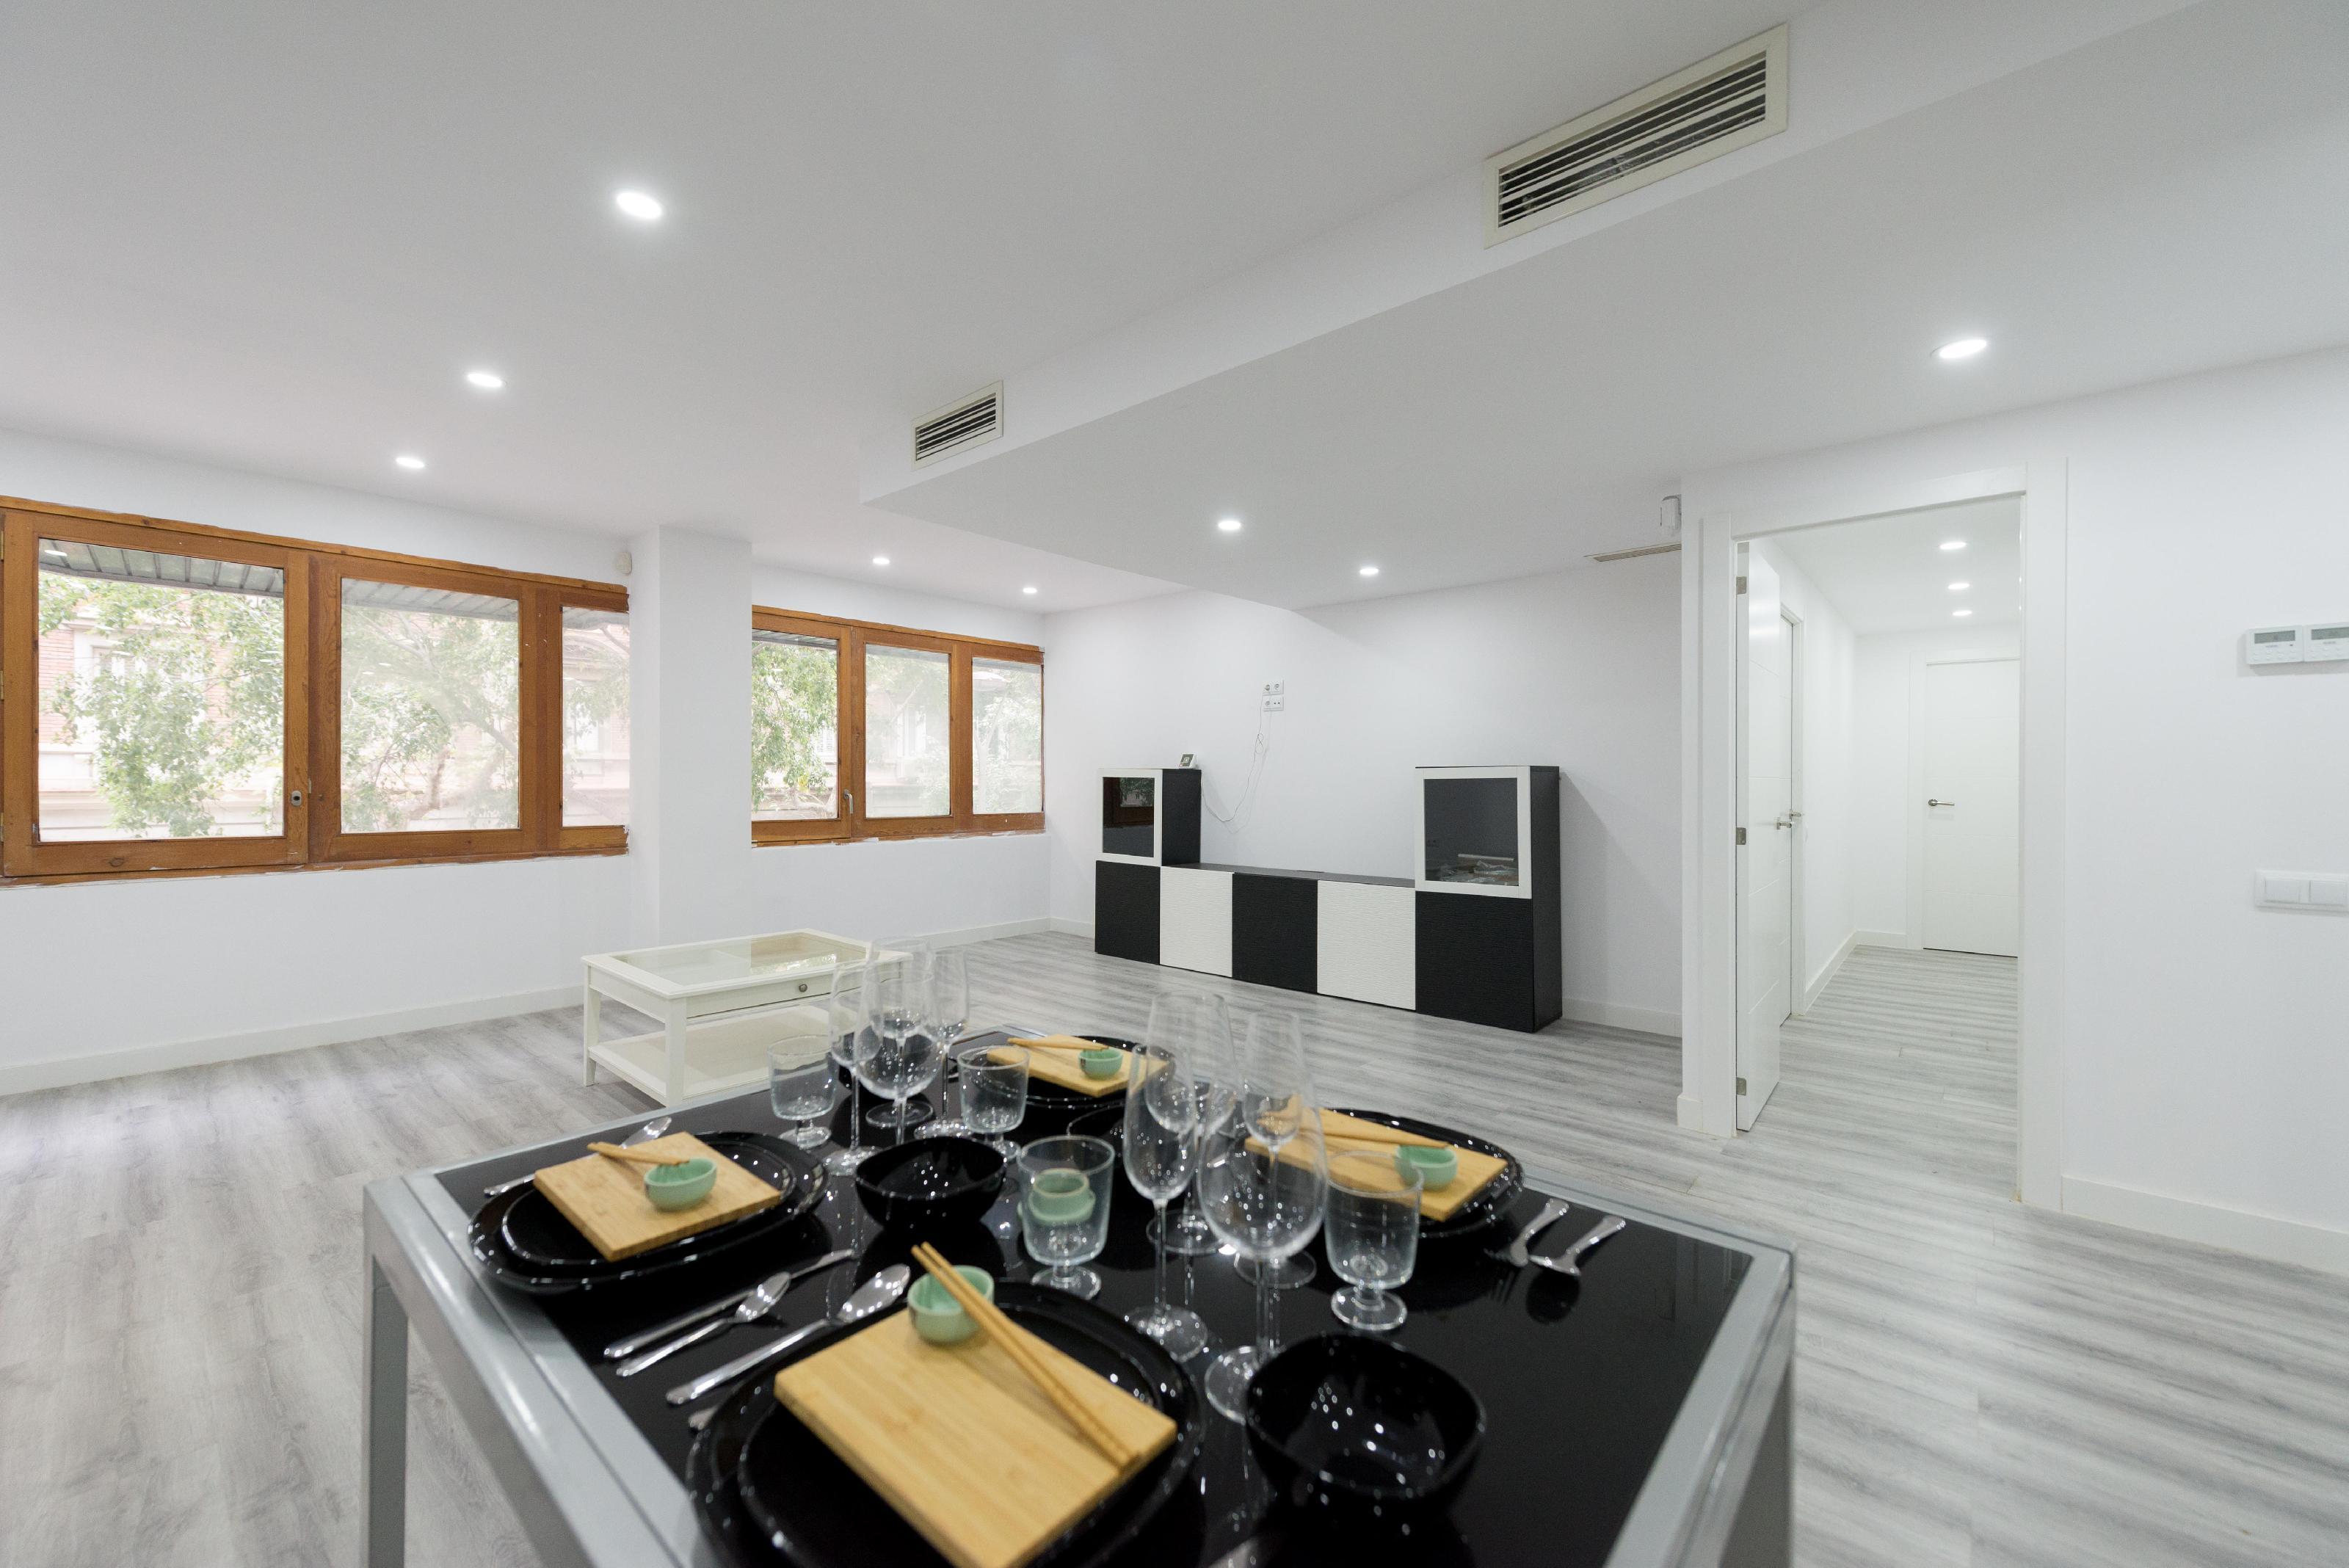 242980 Flat for sale in Eixample, Sagrada Familia 13